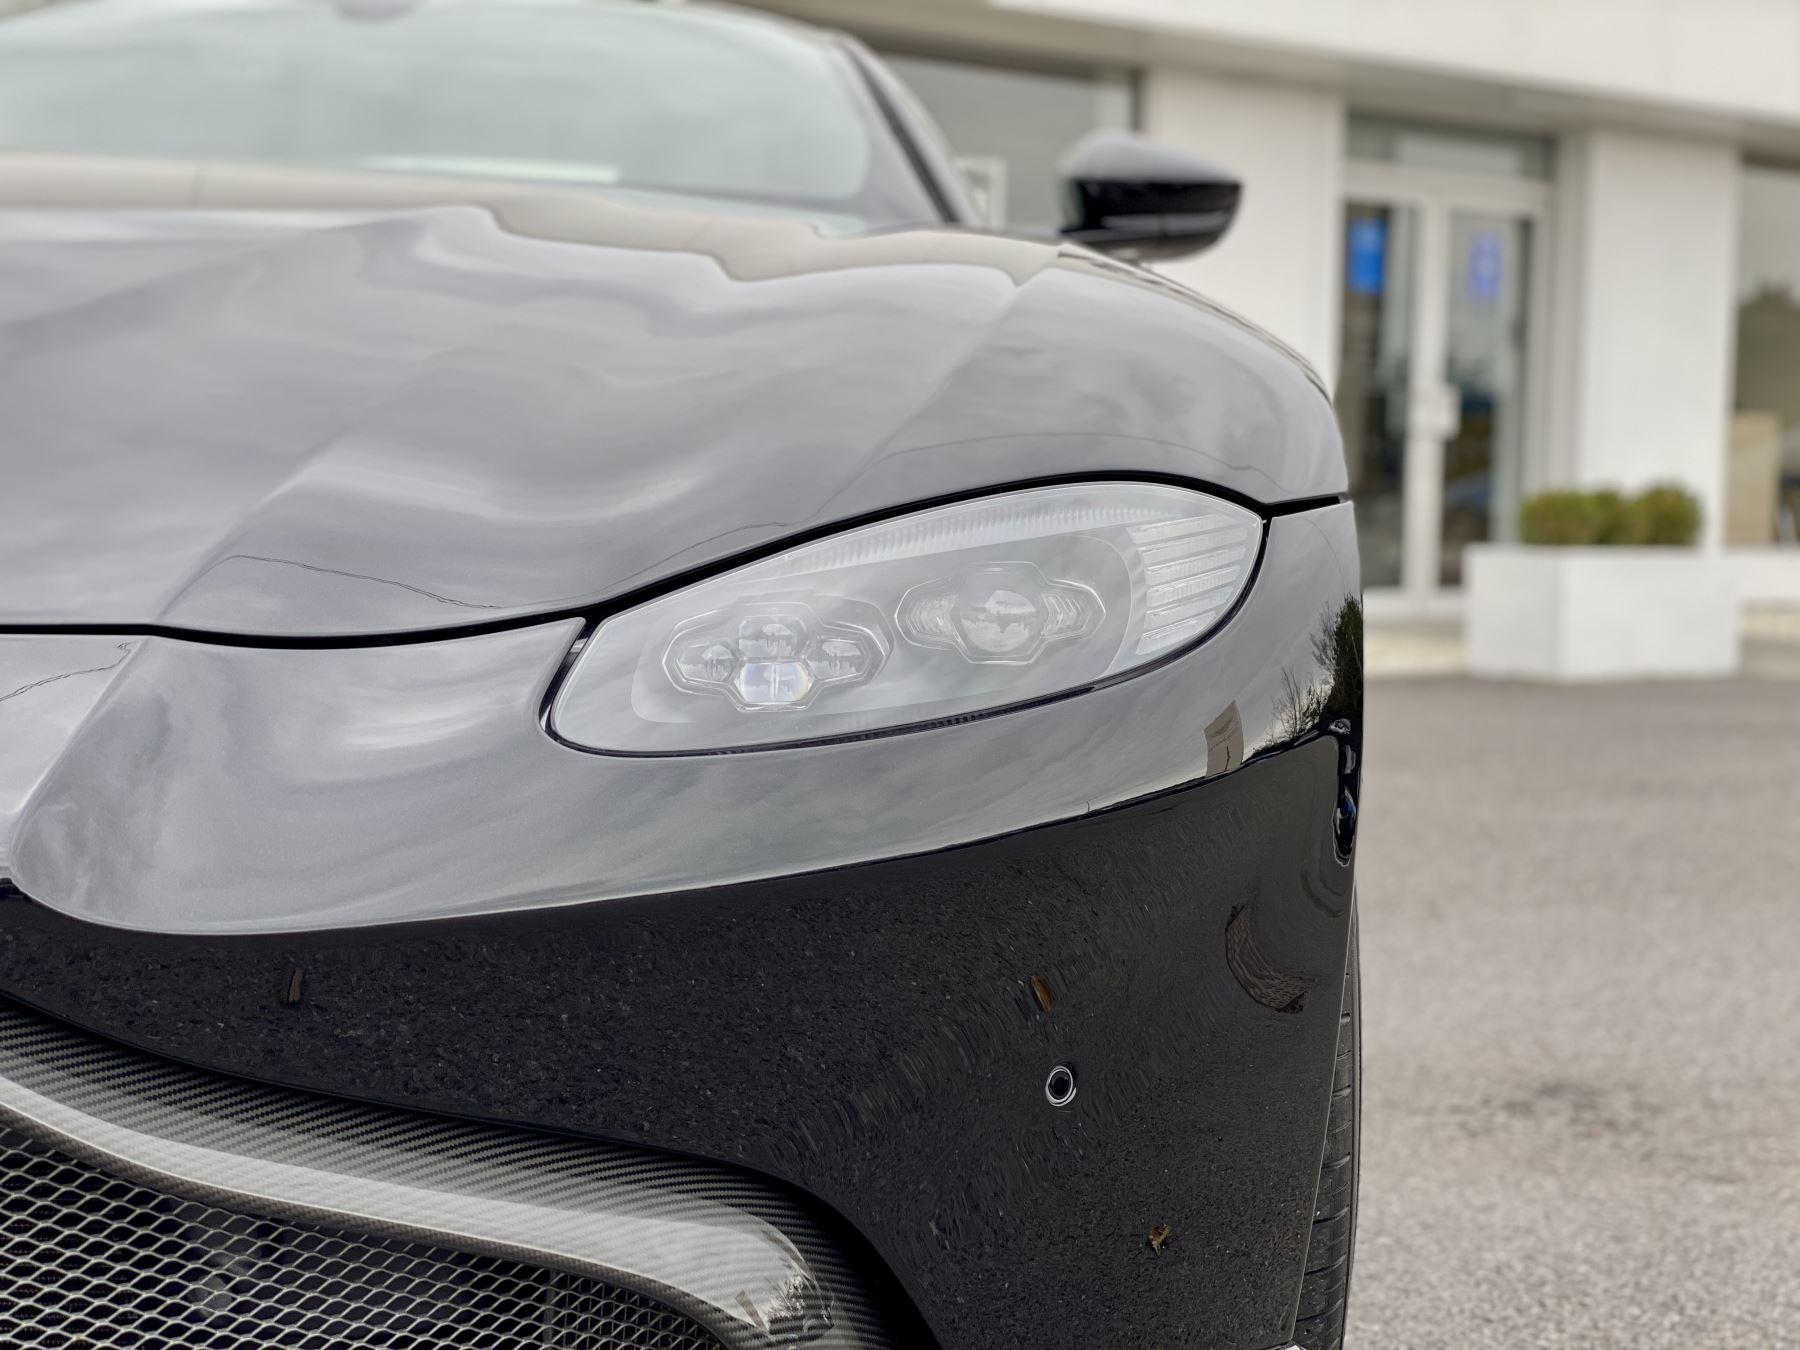 Aston Martin New Vantage 2dr ZF 8 Speed Auto. 4.0 Twin Turbo ZF Gearbox  Reversing Camera Heated Seats Ceramic Brakes image 11